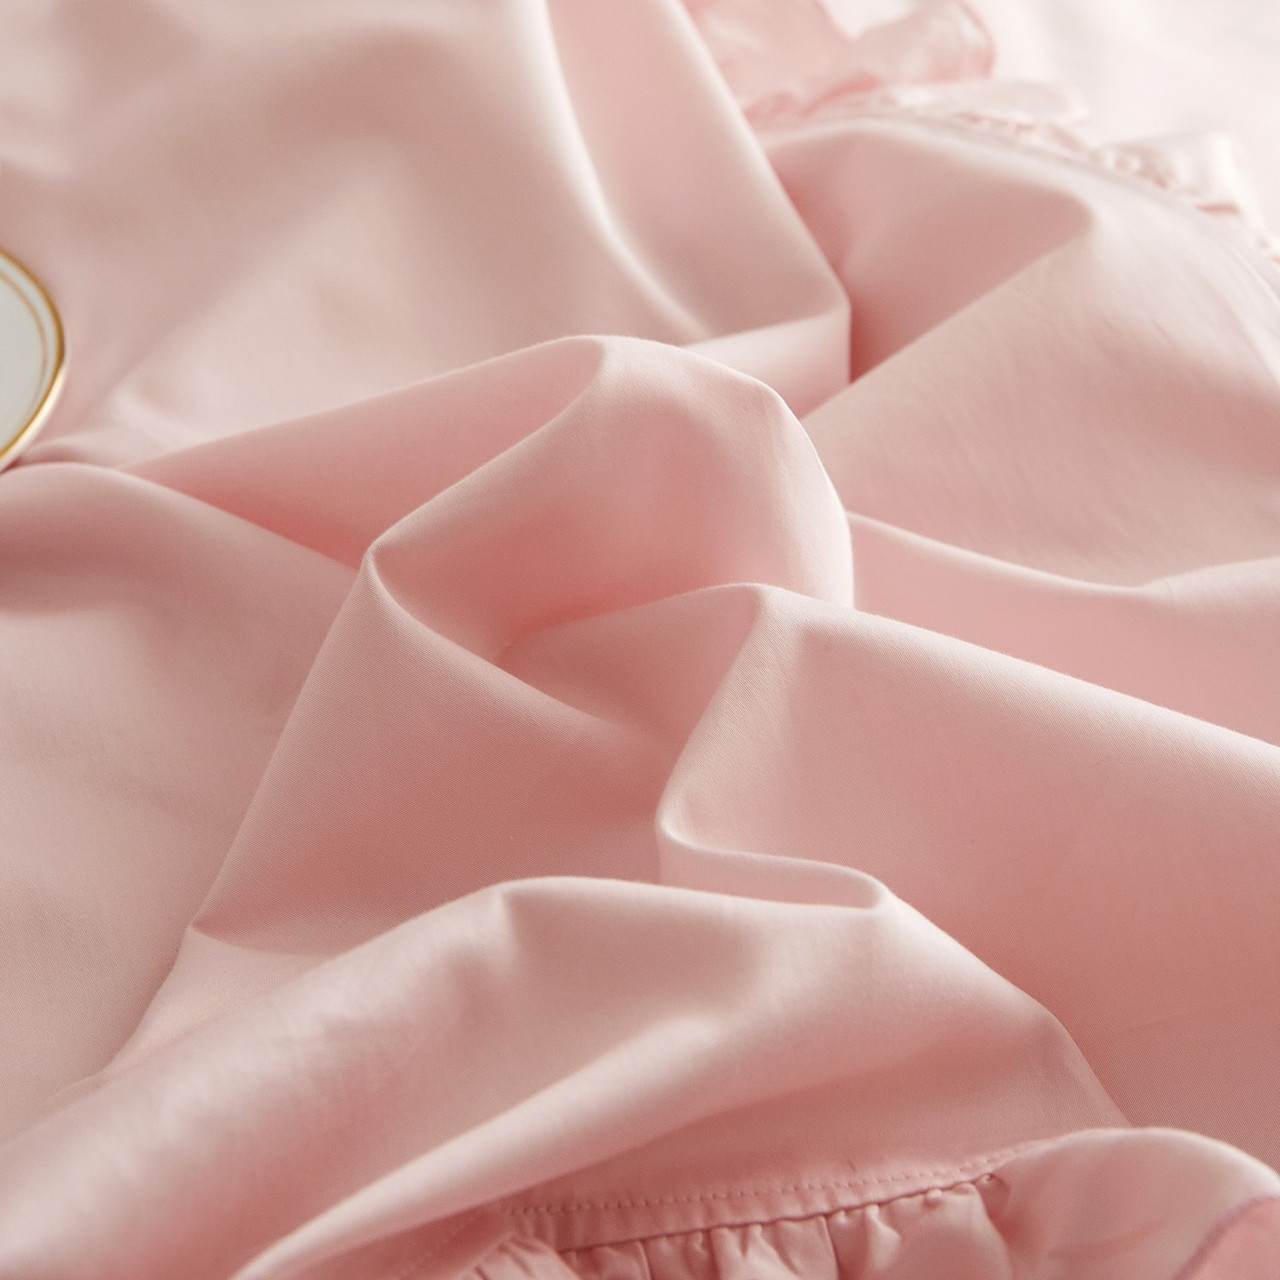 DM808K Ruffle Edge Bedding - Bertha: 6 Pieces Luxury King Size Duvet Cover Set 100% Cotton